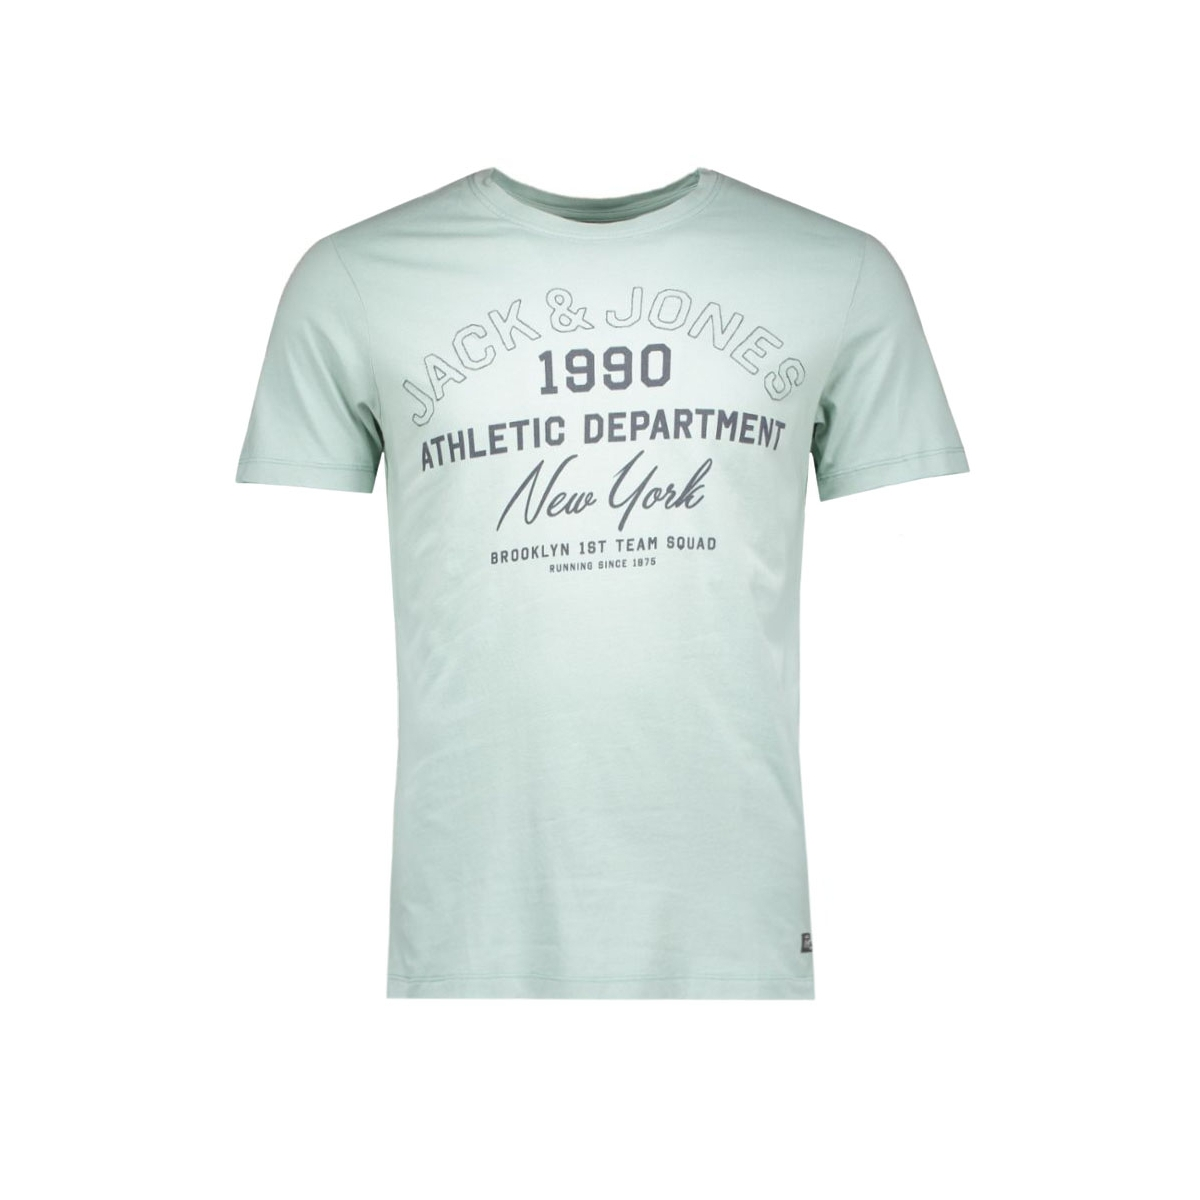 jorklovn tee ss crew neck 12108424 jack & jones t-shirt mineral blue